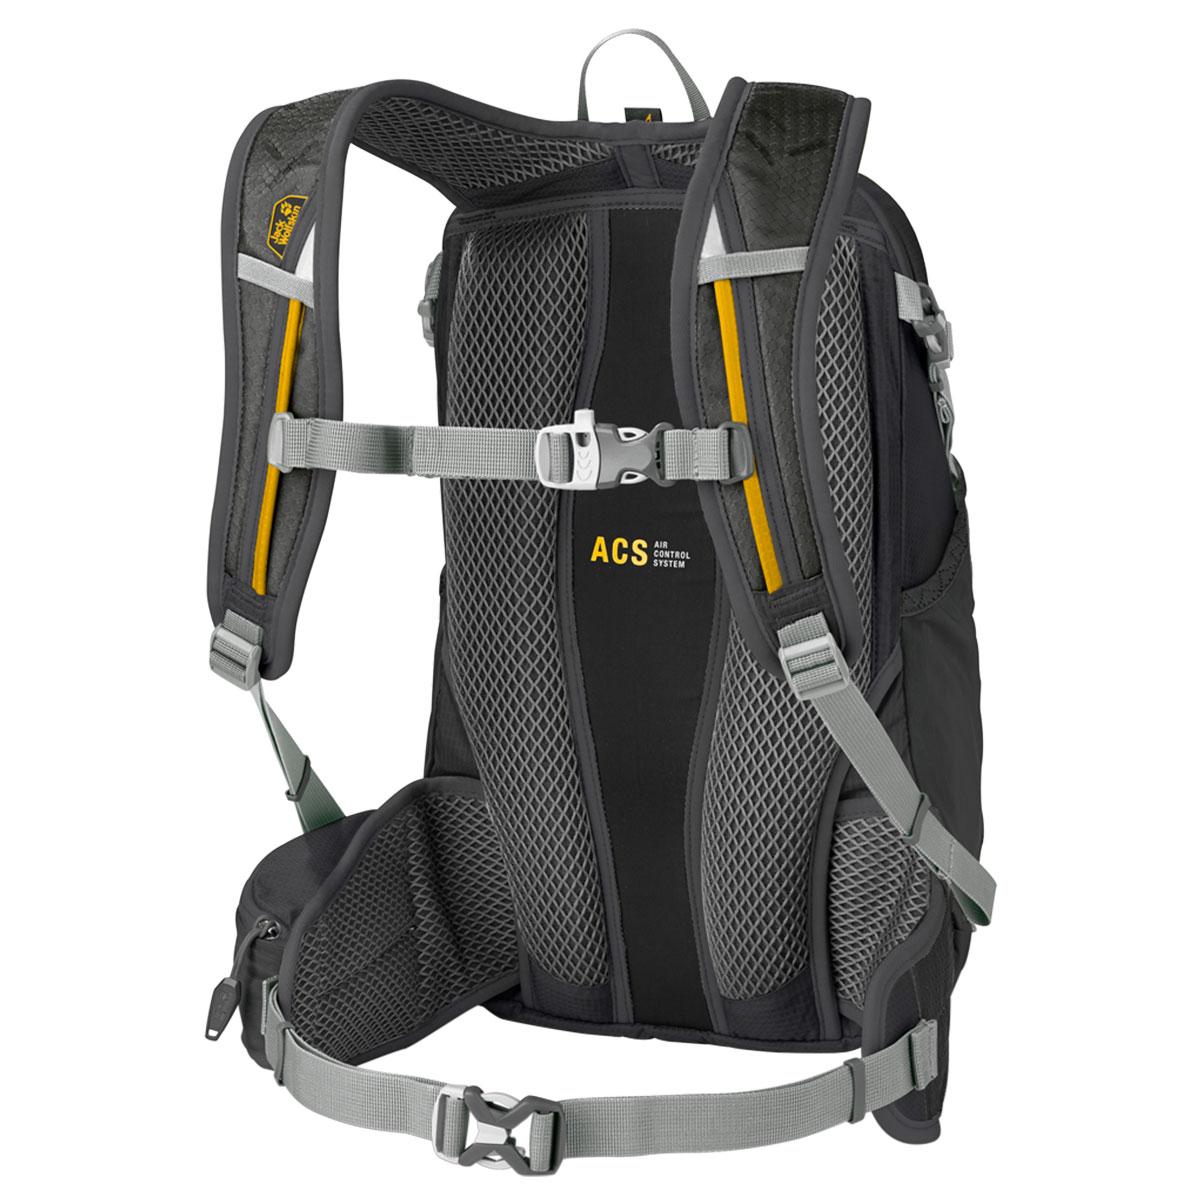 Jack Wolfskin Unisex Moab Jam 18 Breathable Lightweight Durable Rucksack